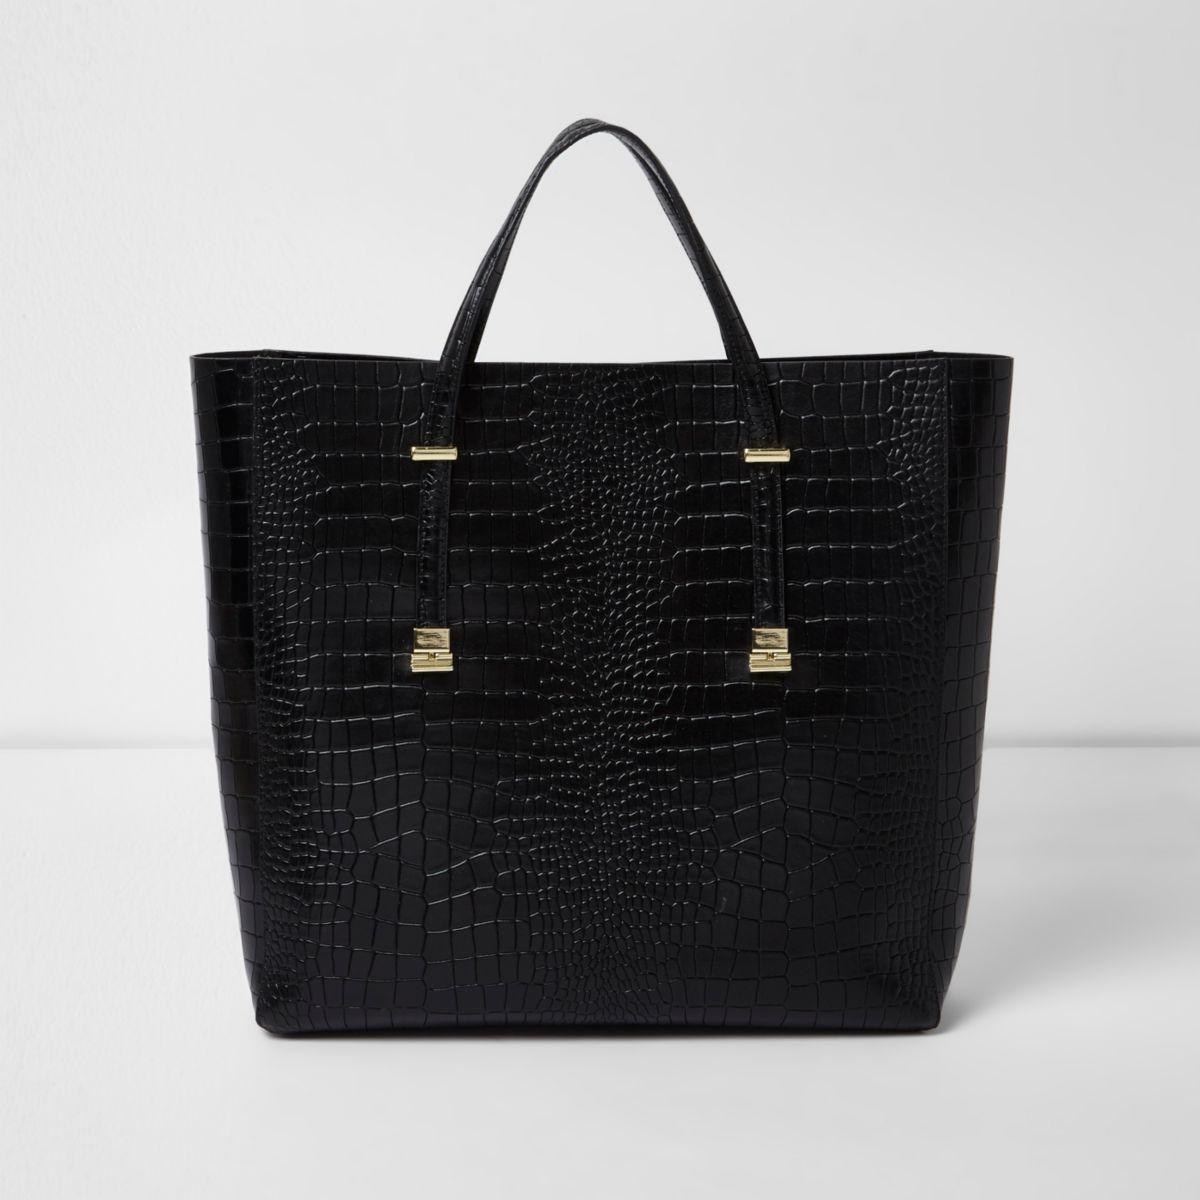 Black croc embossed leather tote bag